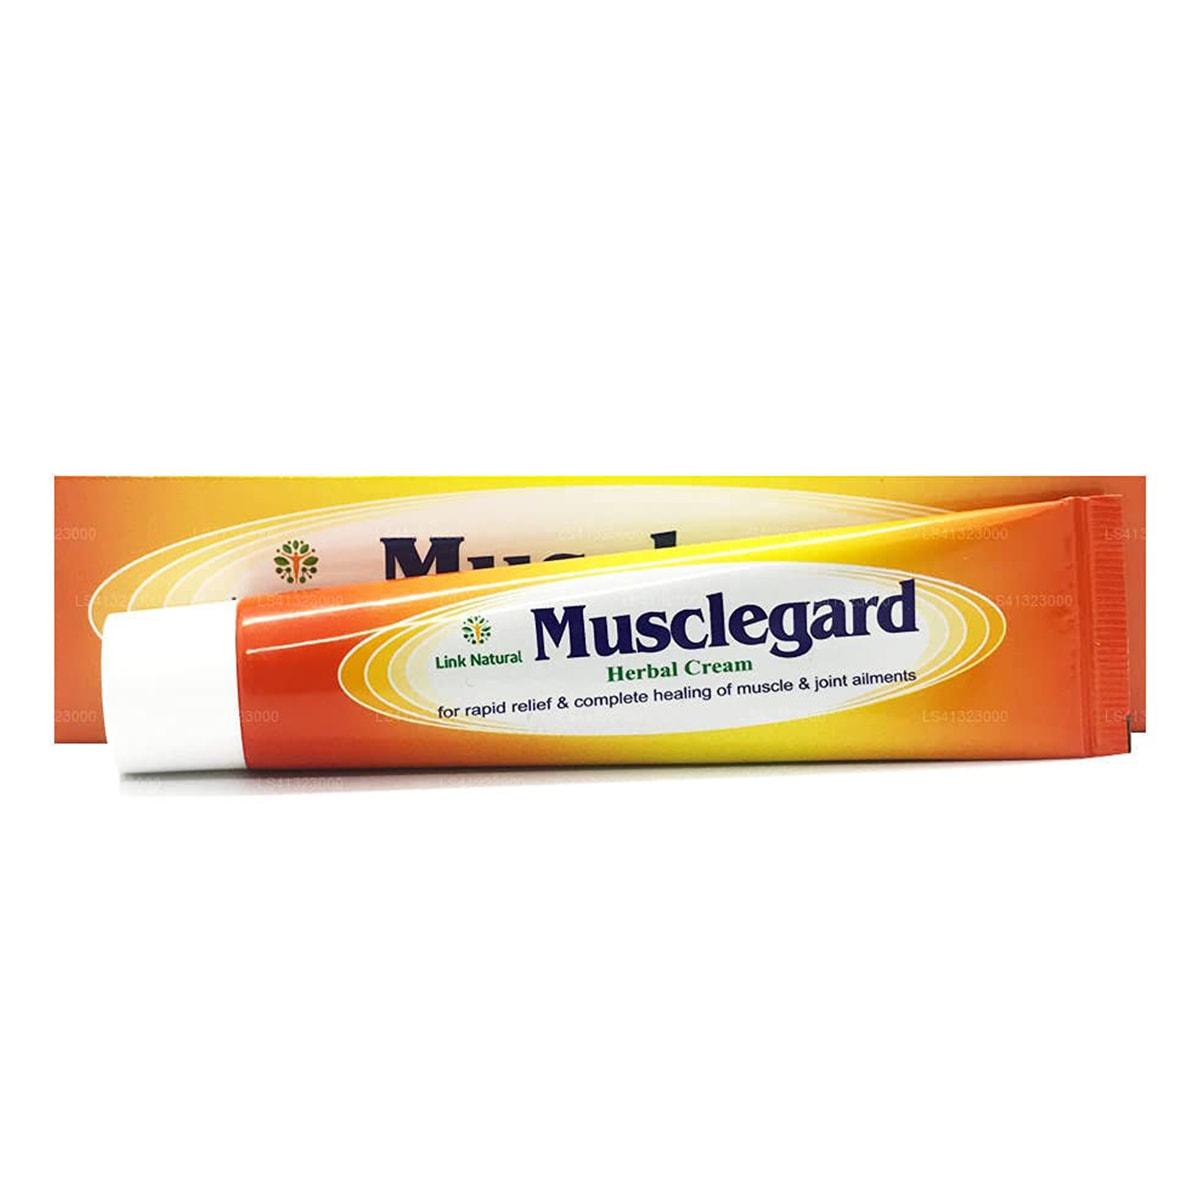 Buy Link Natural Musclegard Herbal Cream - 25 gm